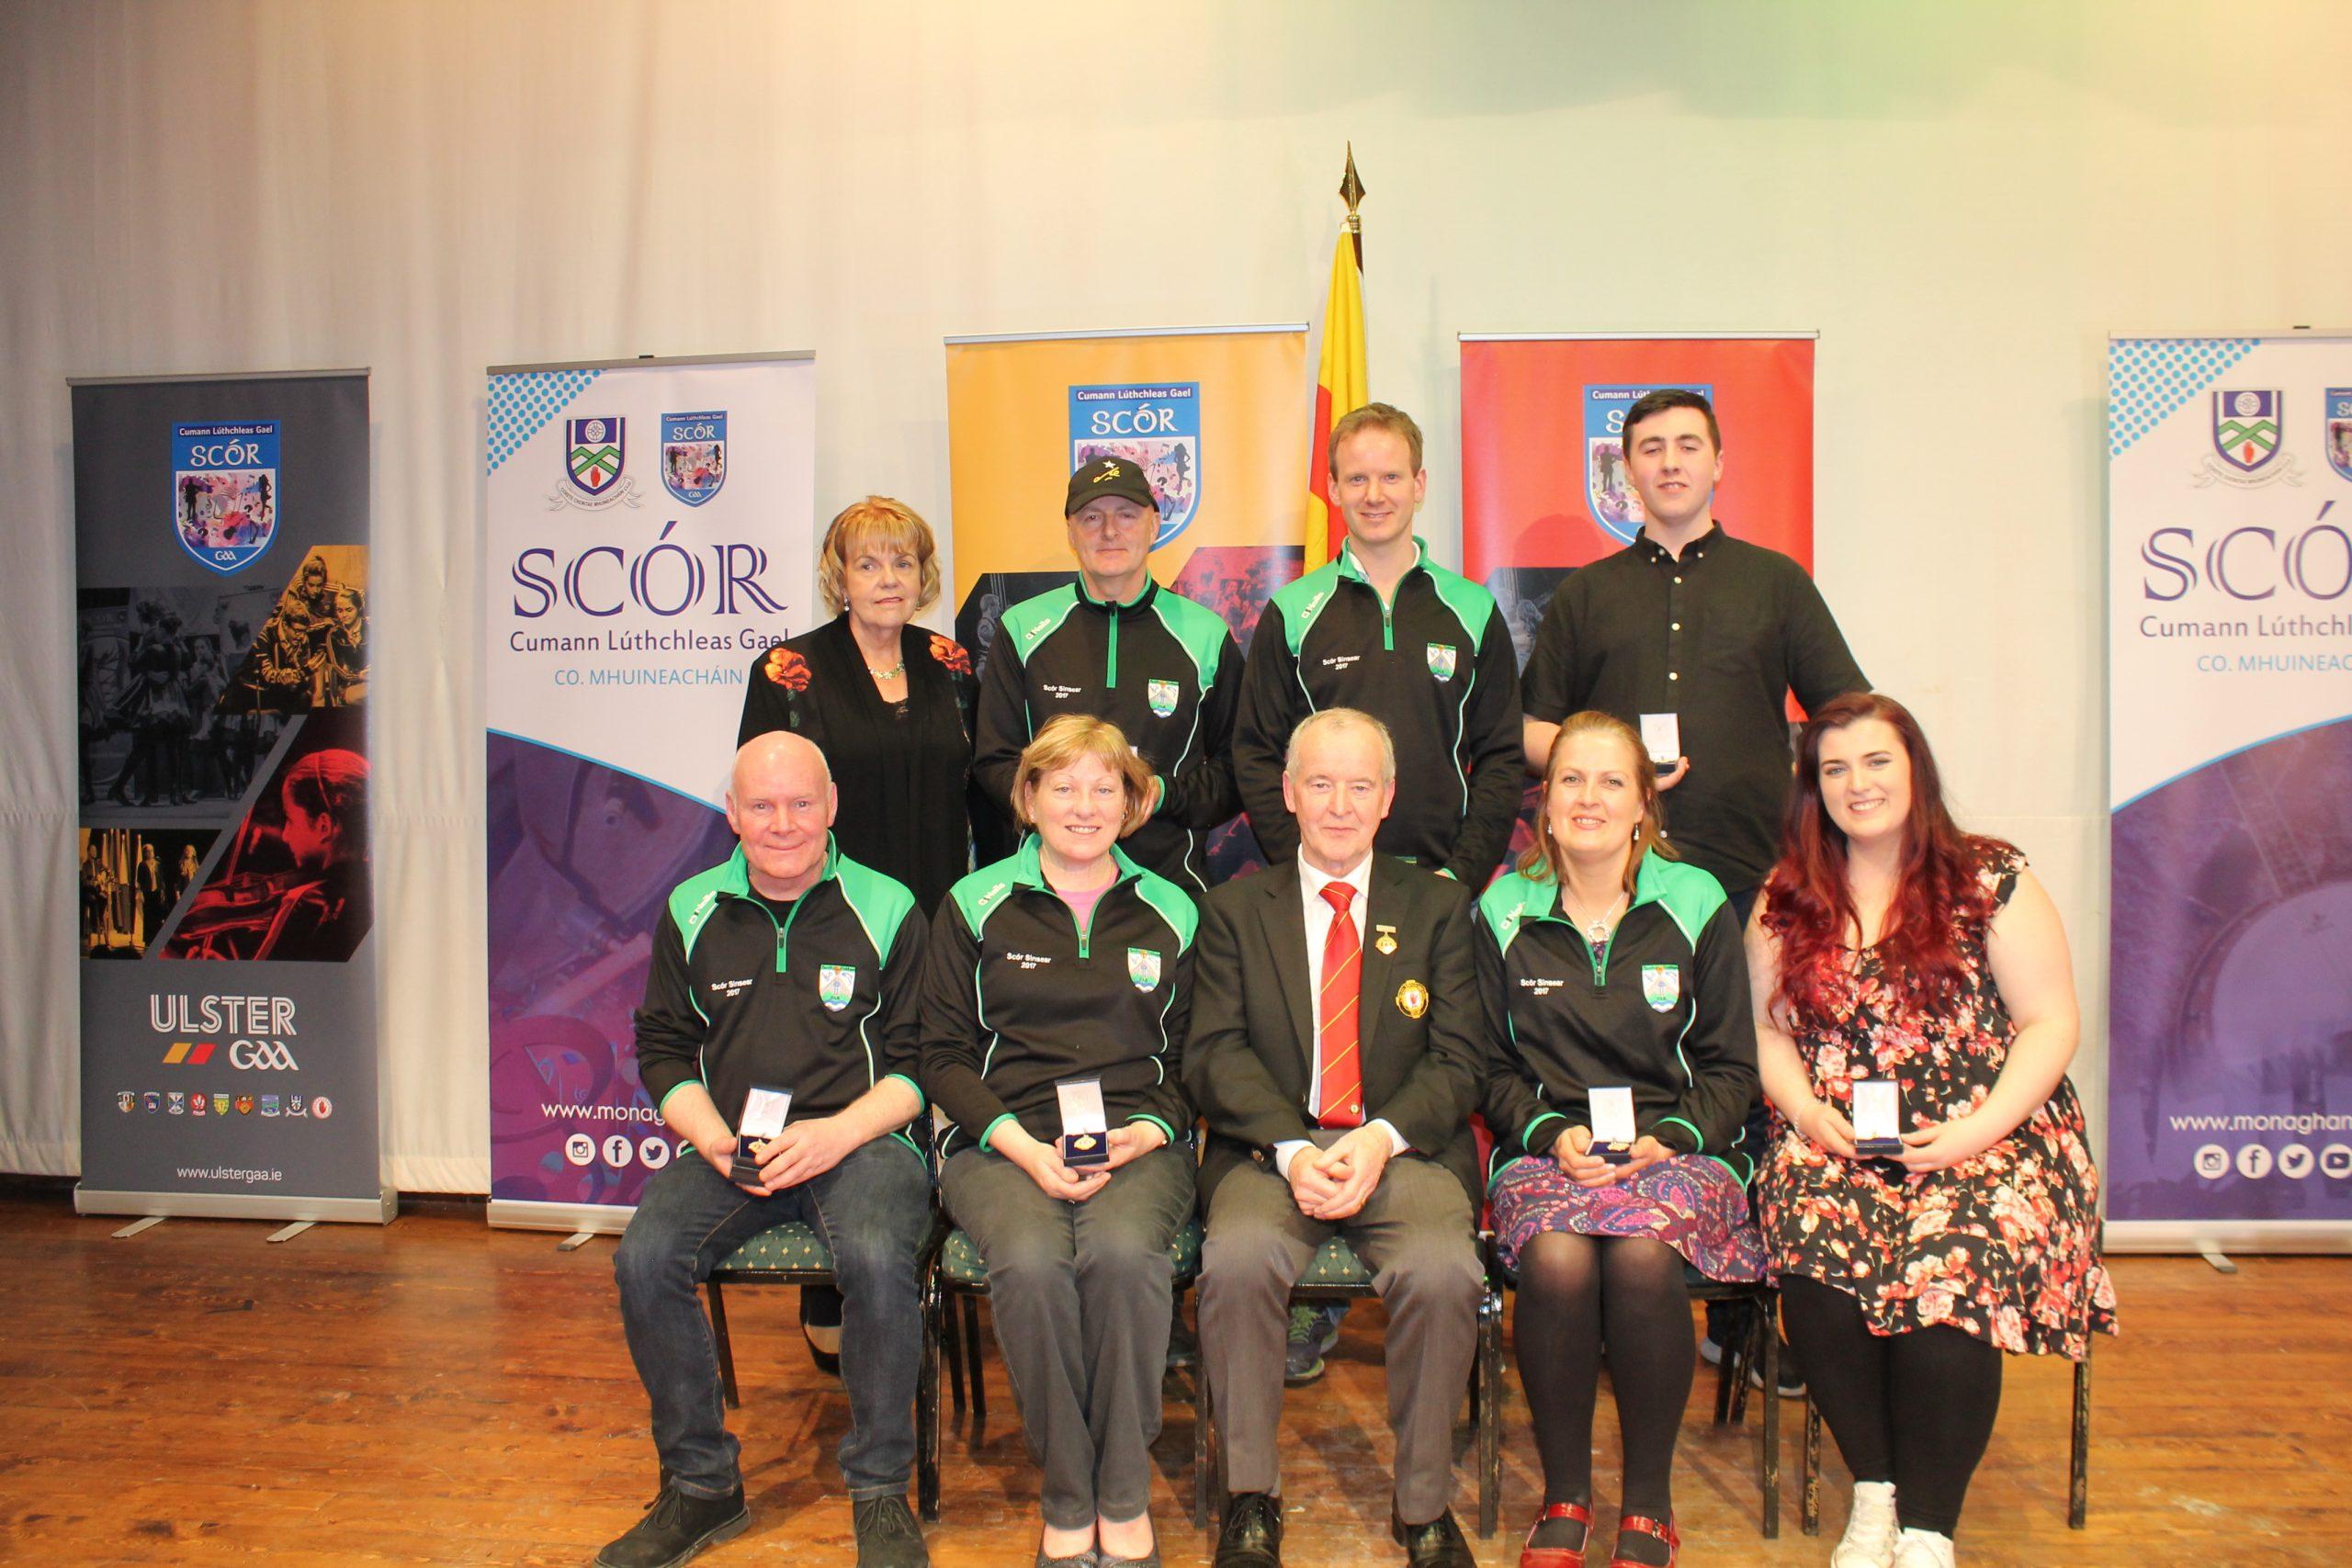 All Ireland Scór Sinsear Final coming to Belfast